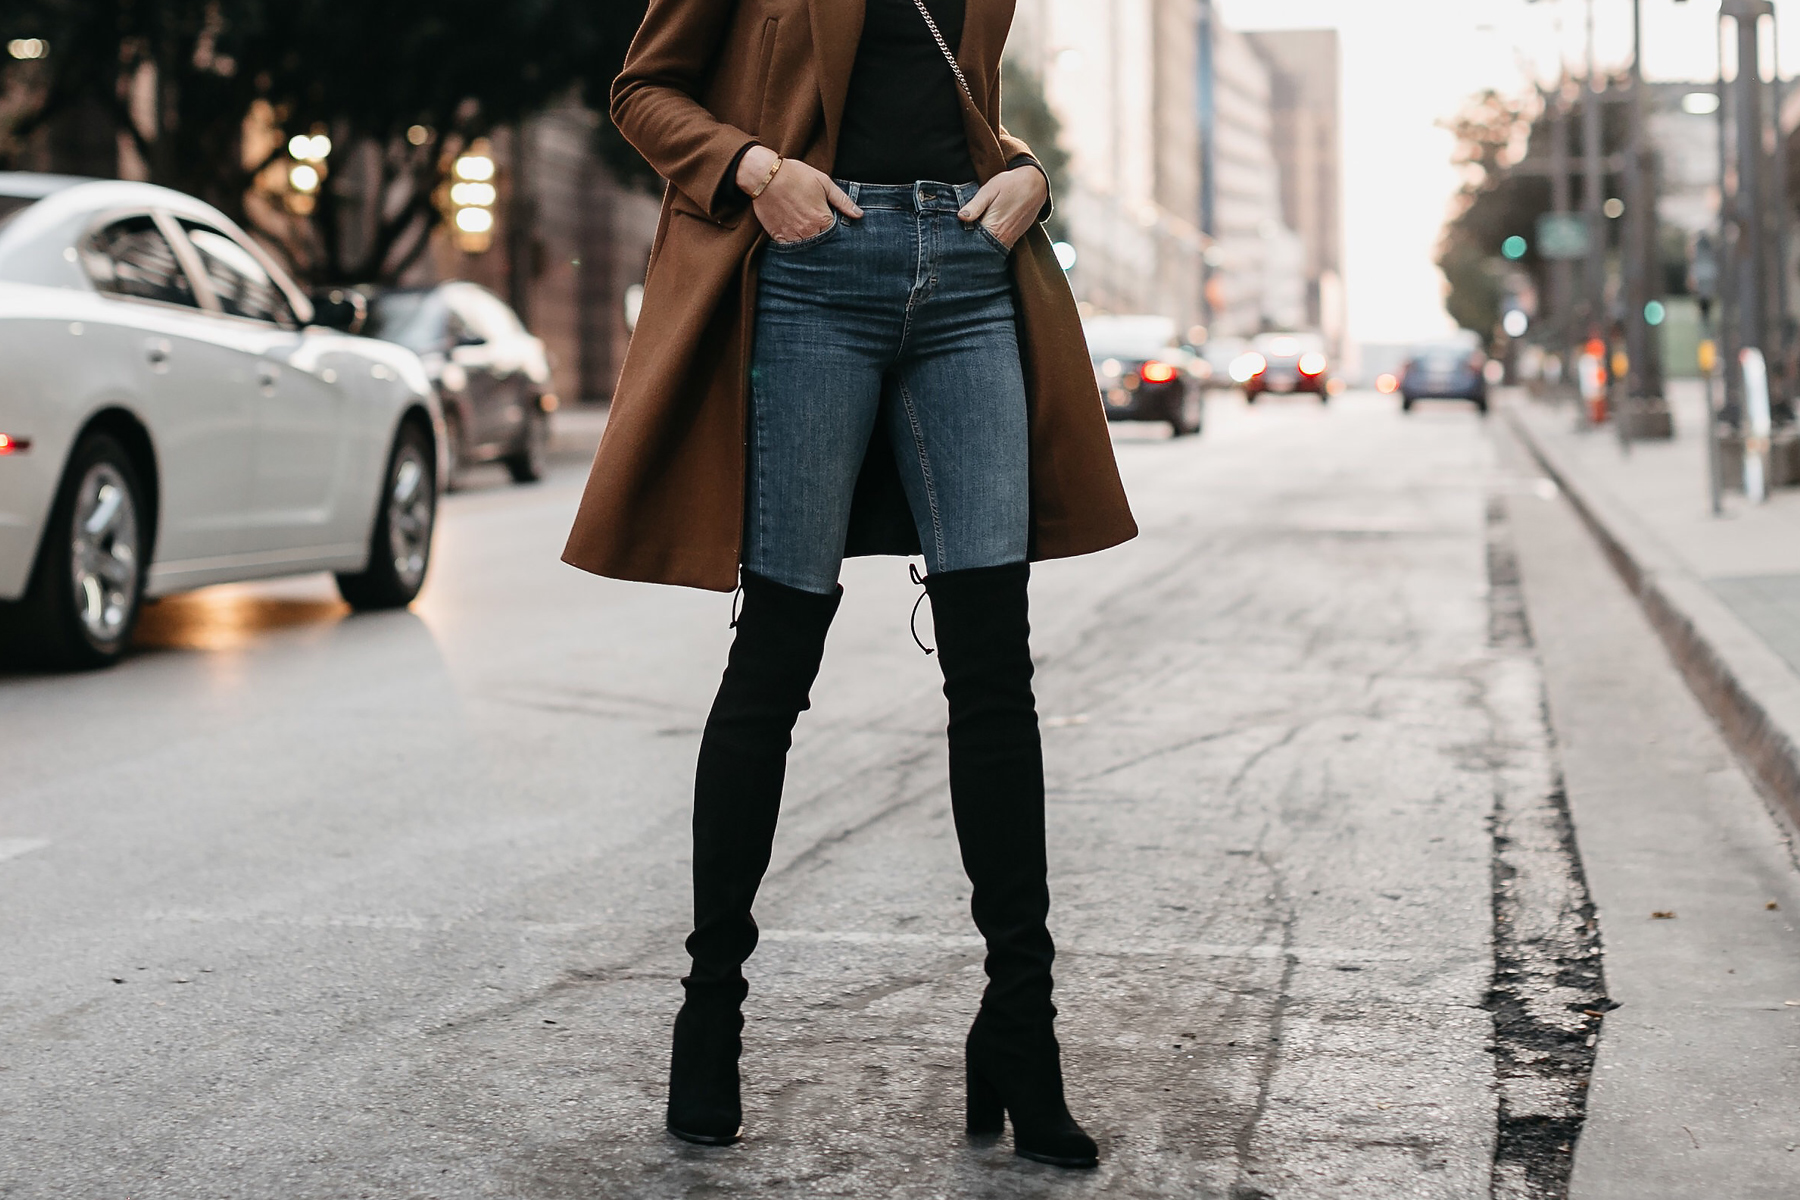 Denim Skinny Jeans Stuart Weitzman Black Over the Knee Boots Fashion Jackson Dallas Blogger Fashion Blogger Street Style